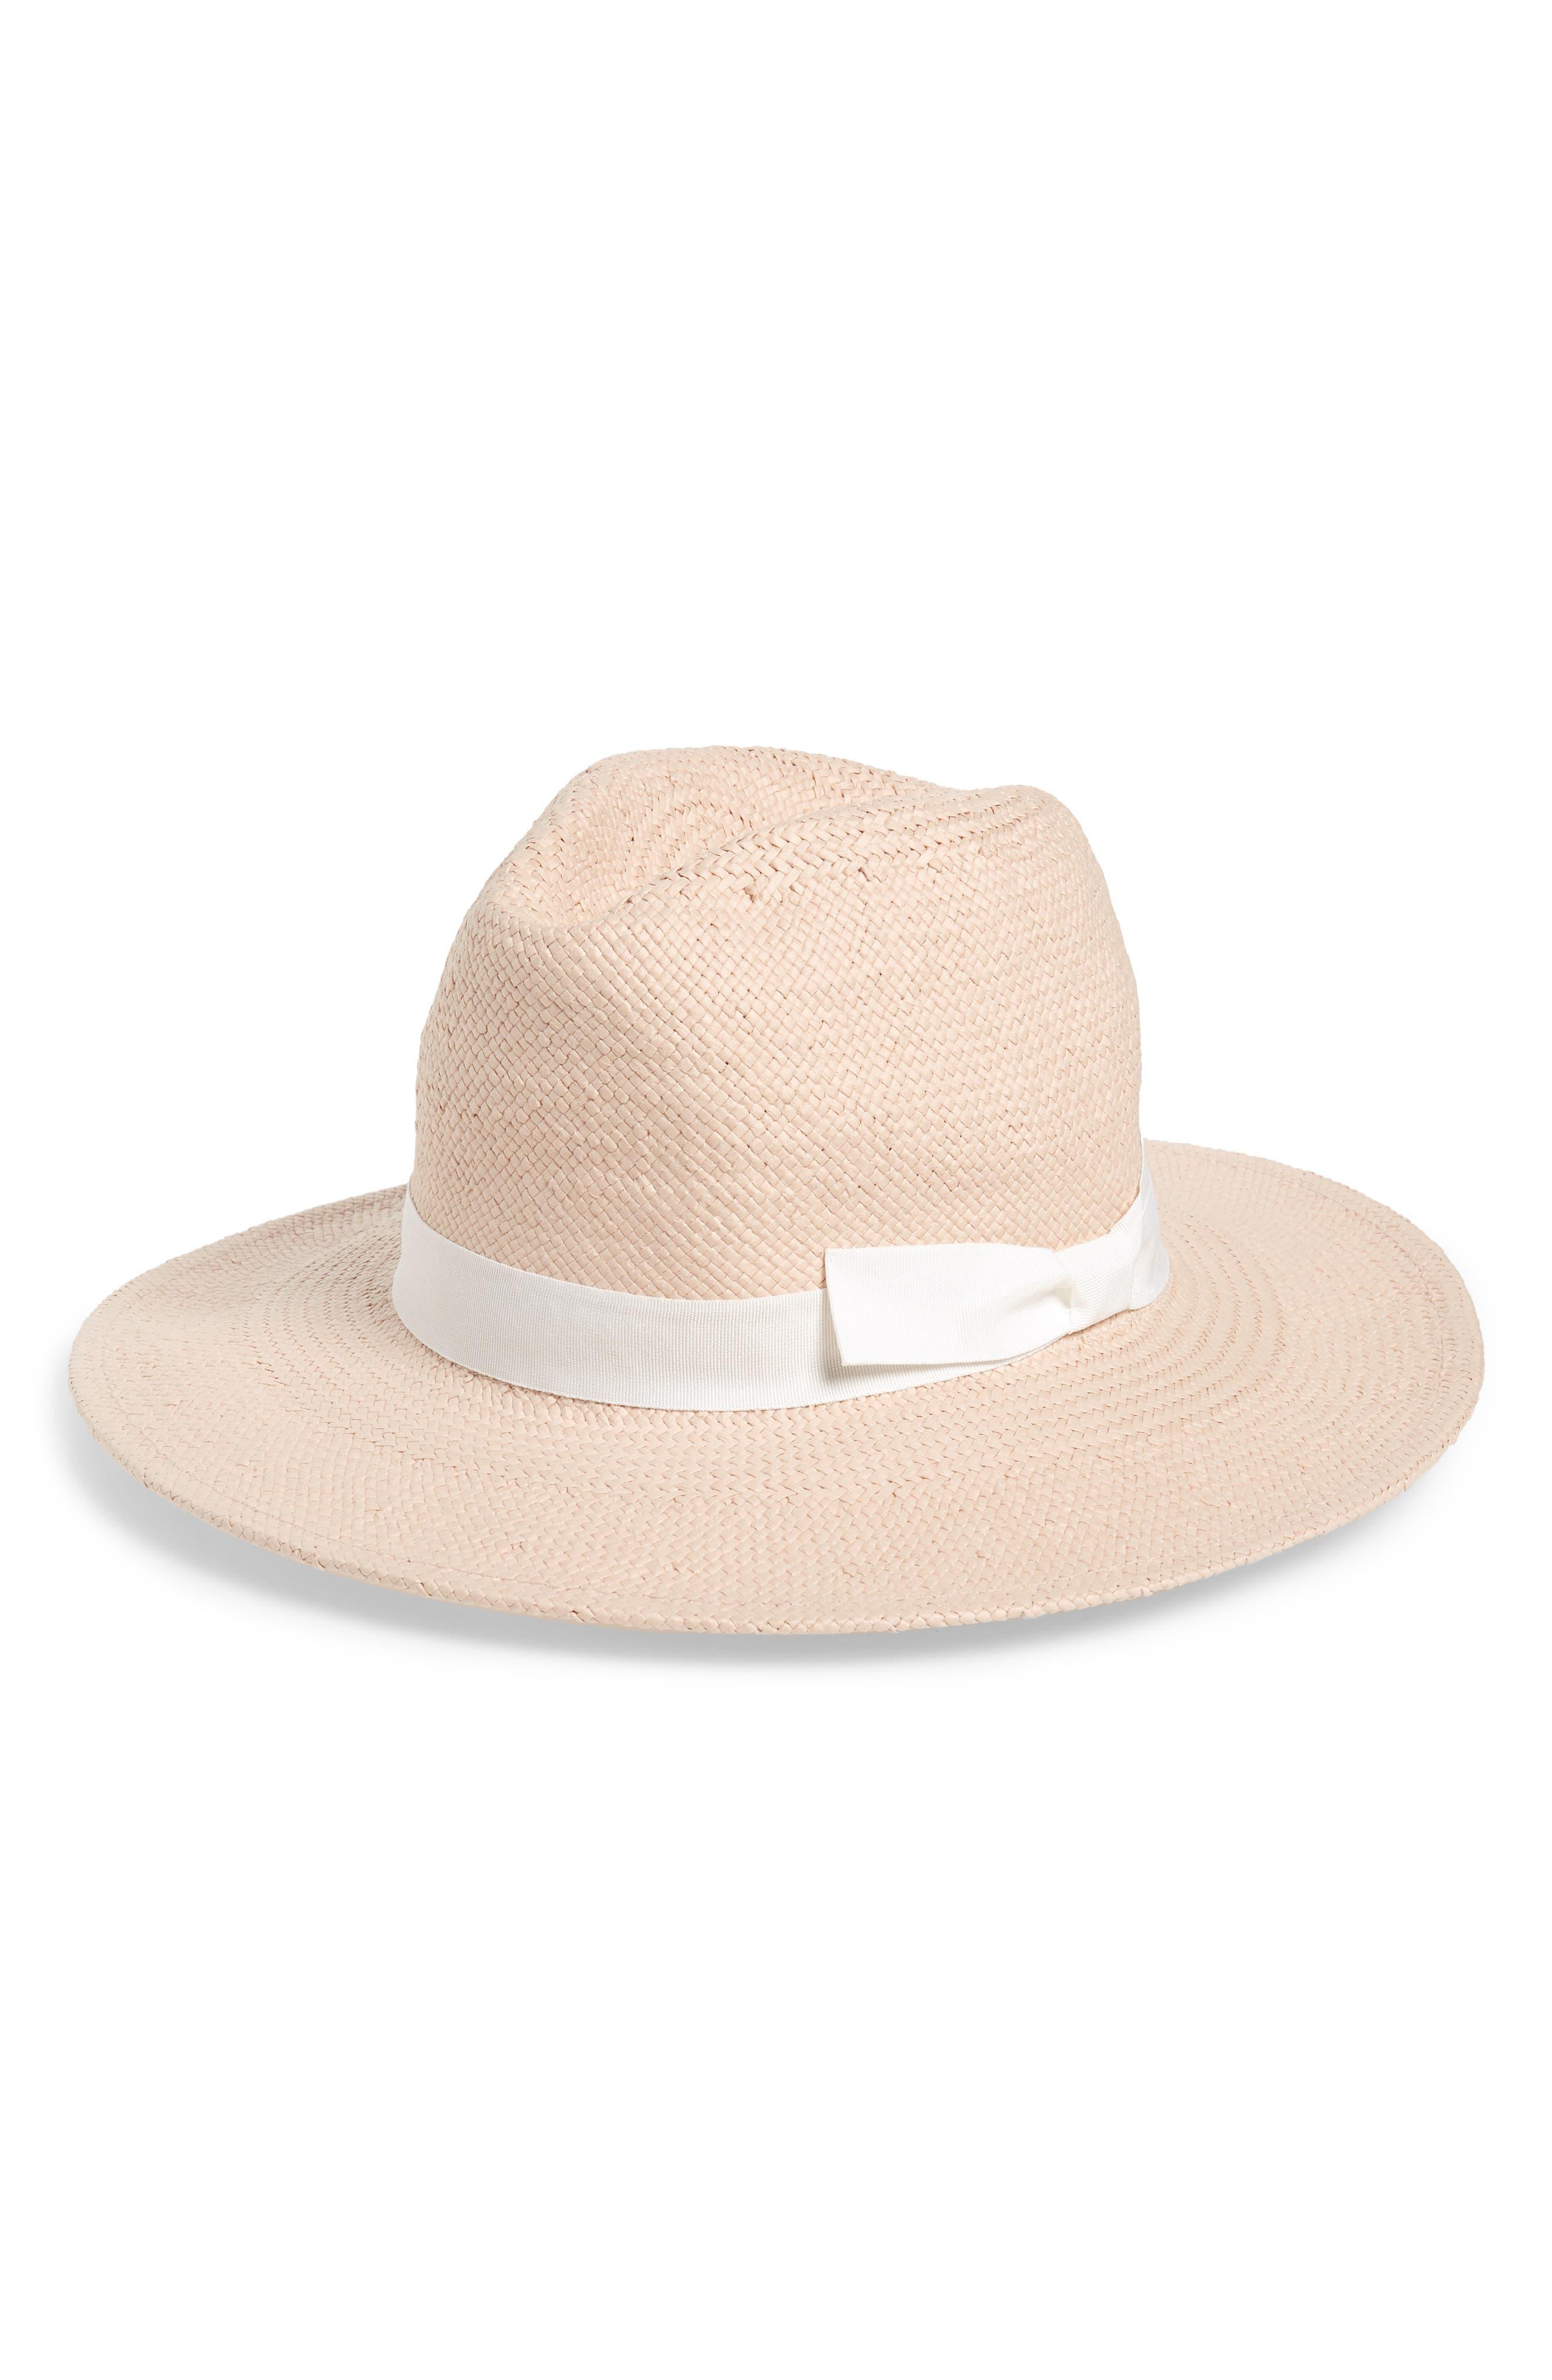 dff53cd6d97 Halogen® Hats for Women